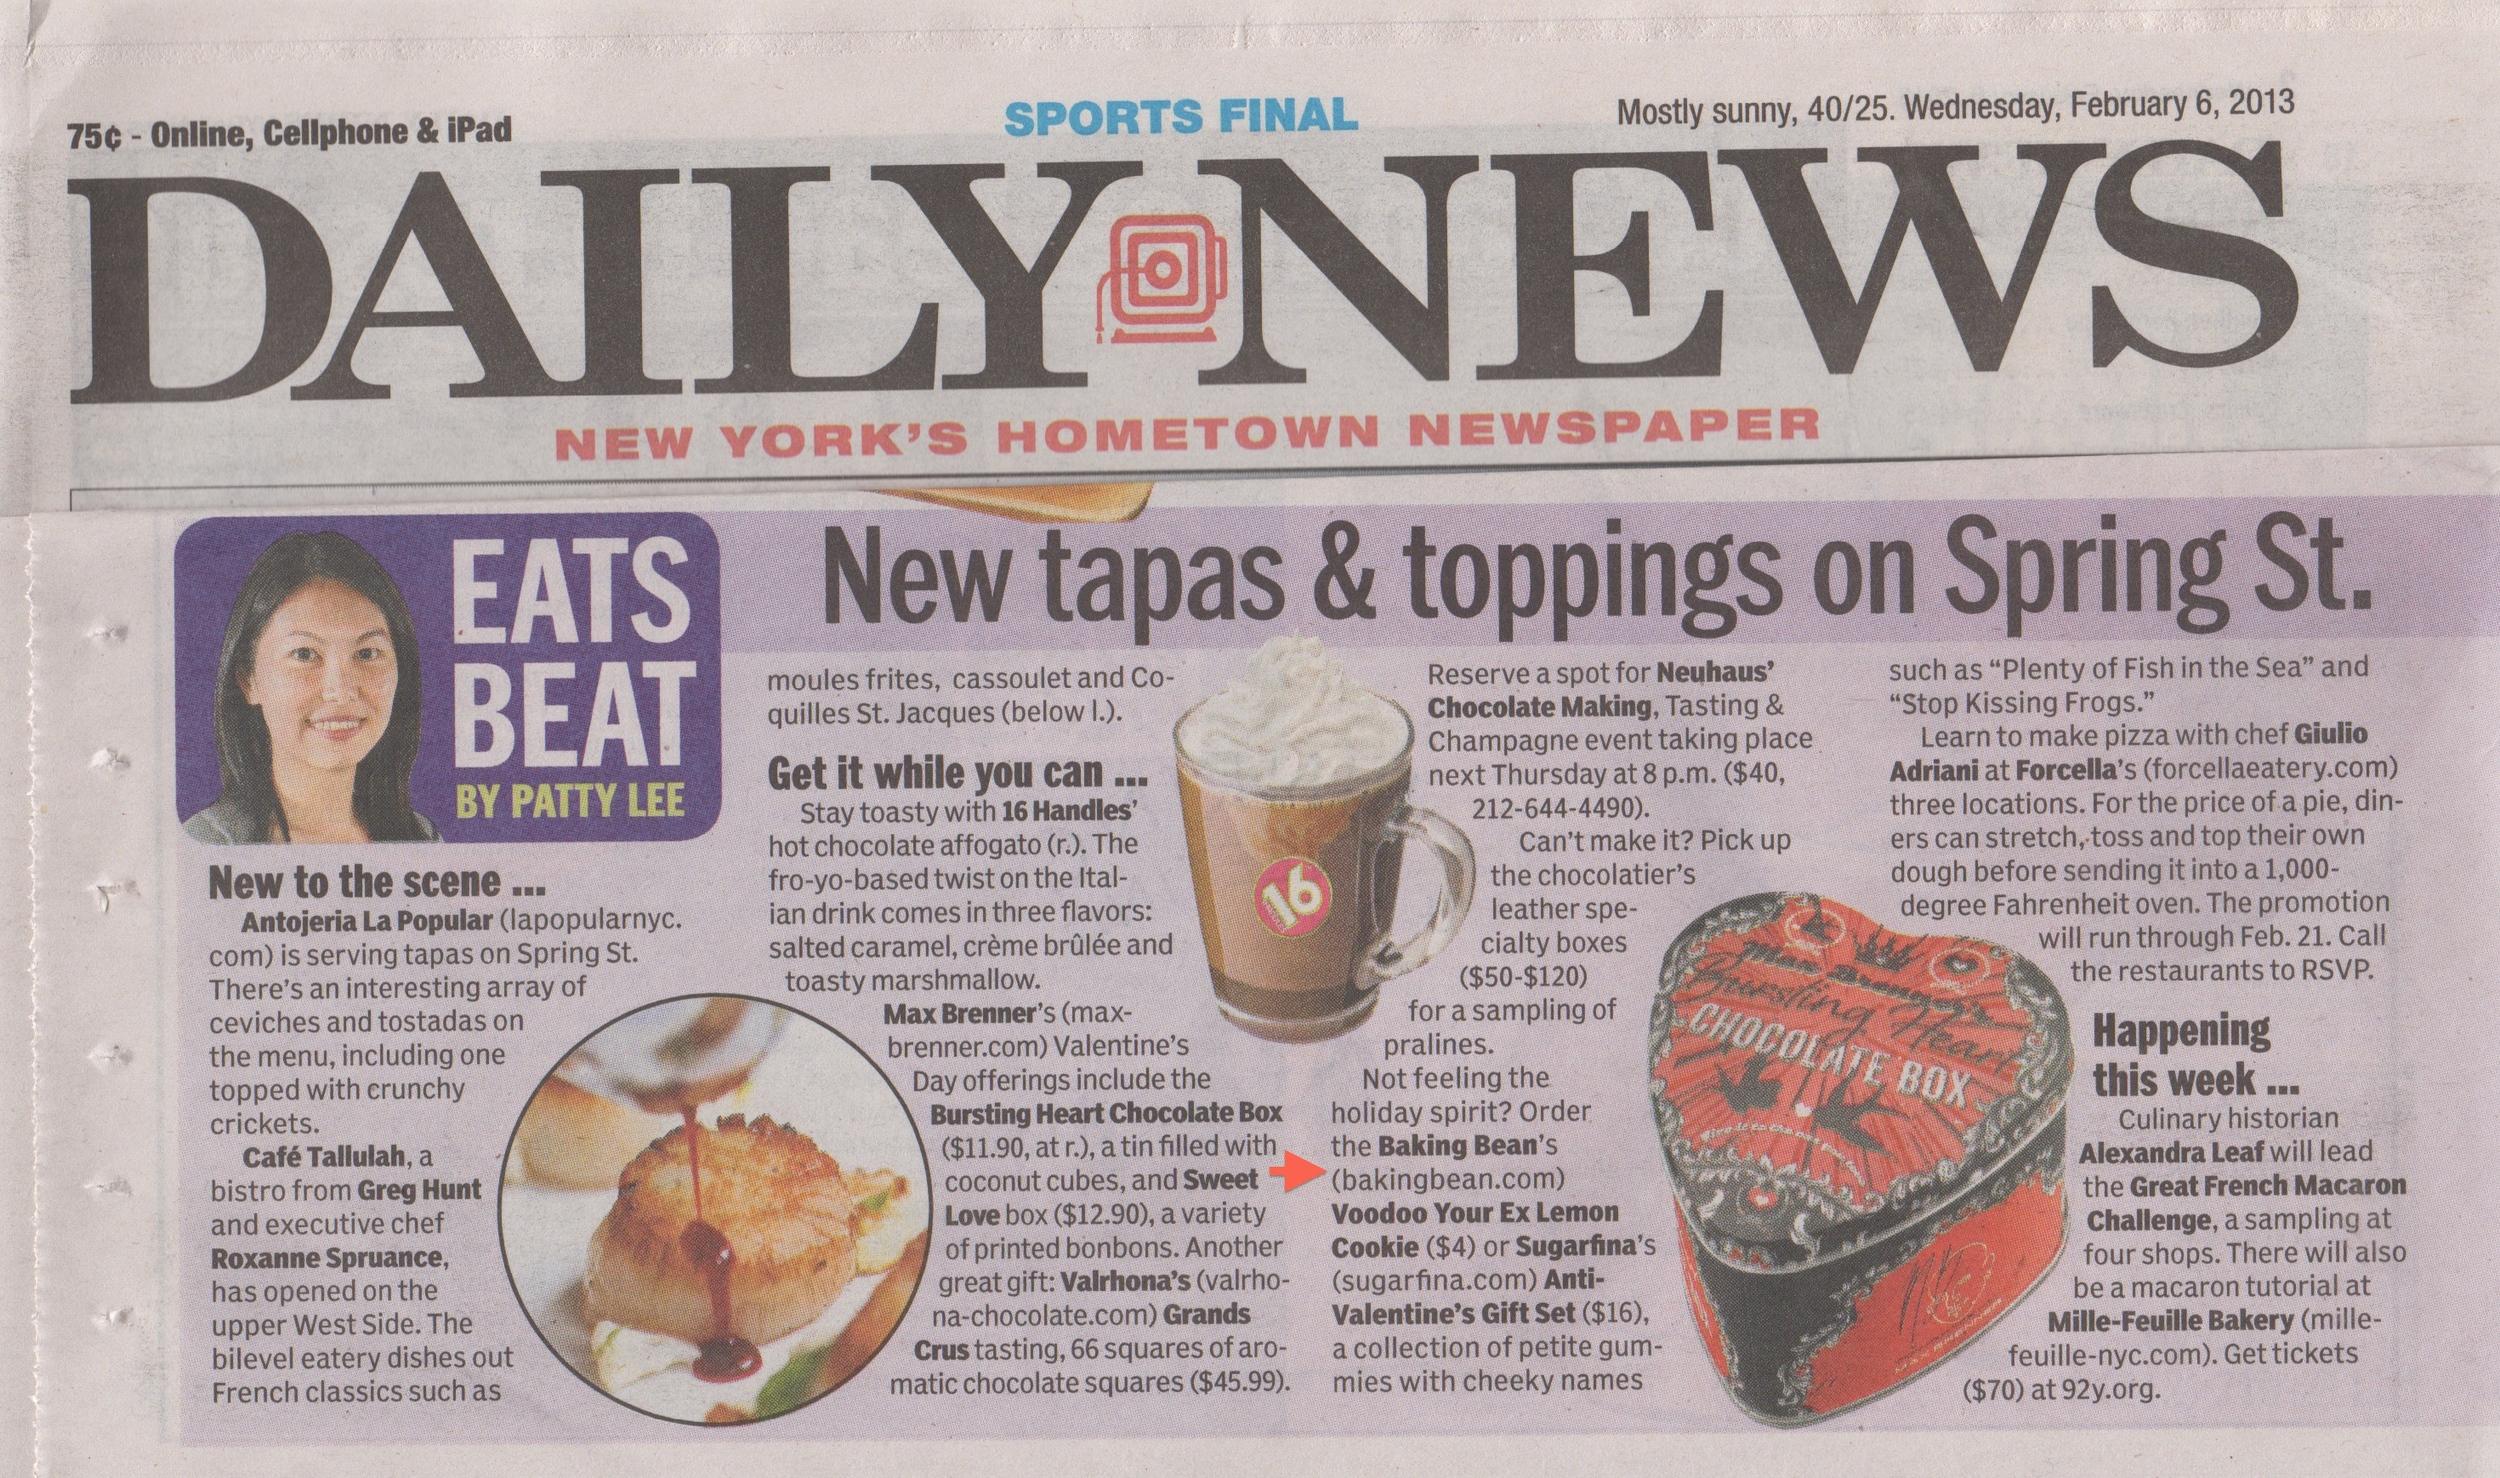 Daily_News_February_6_2013.jpg